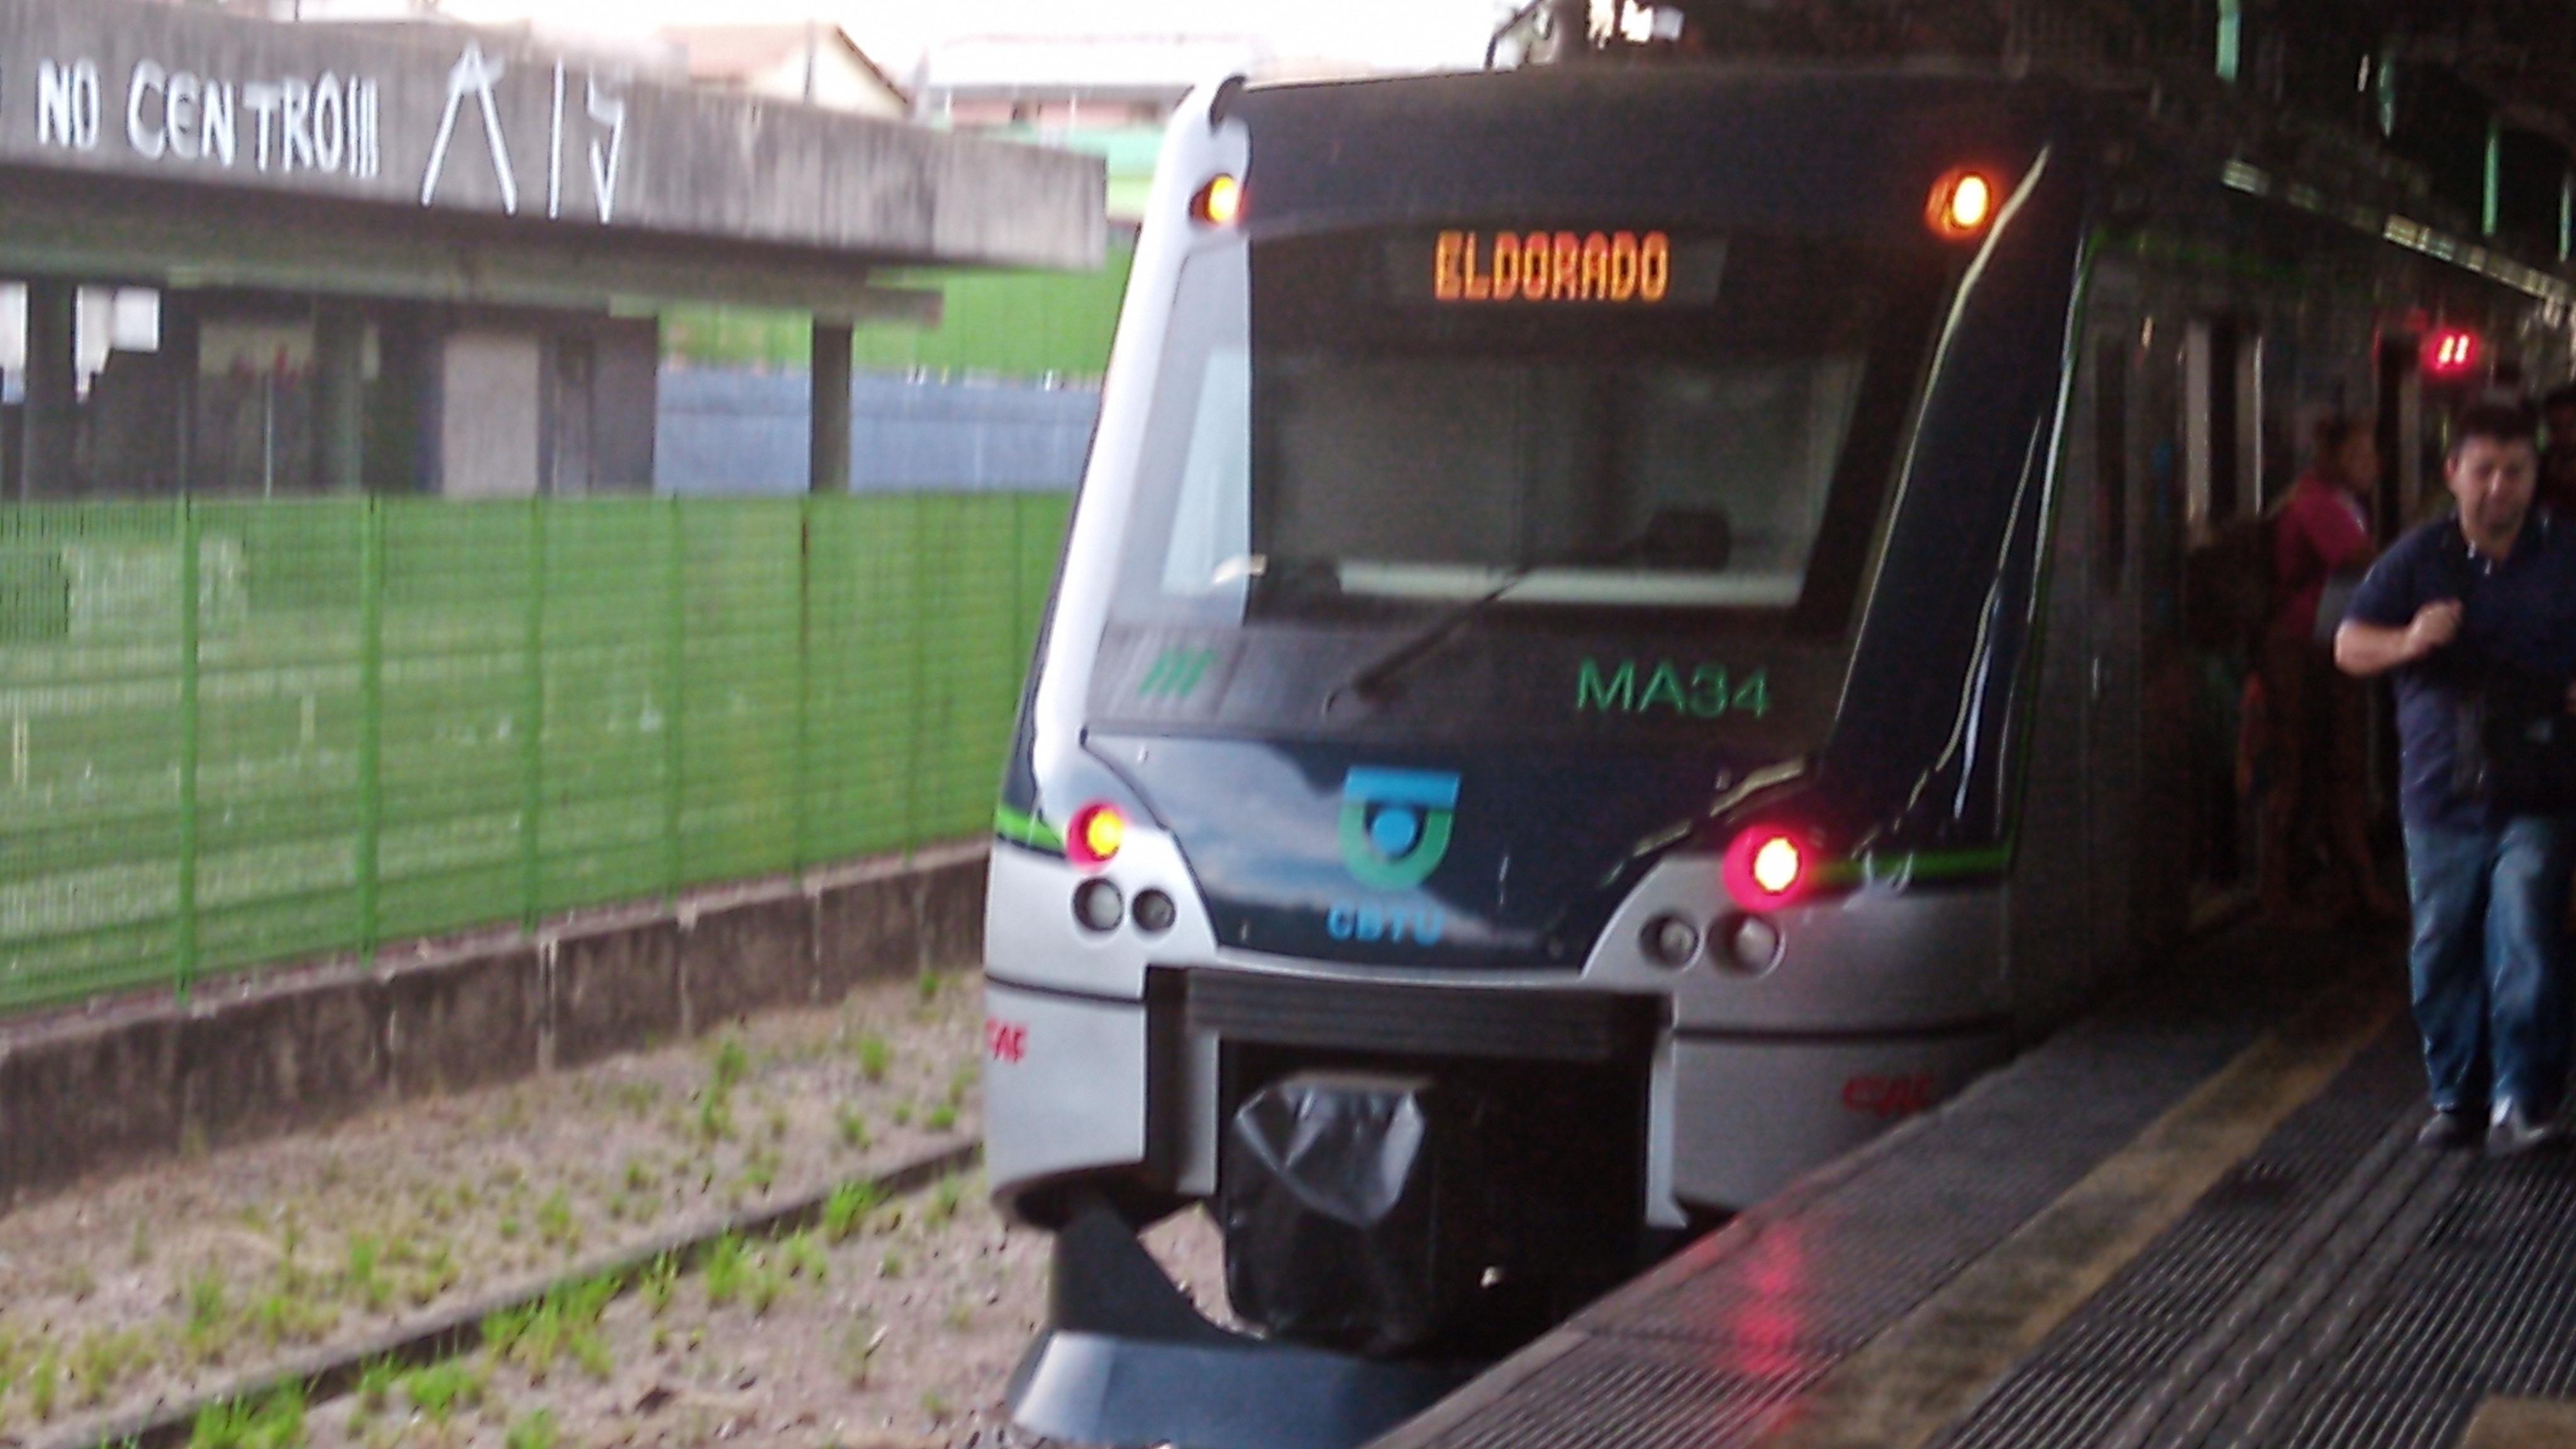 Metro - Foto: Por Dentro de Minas